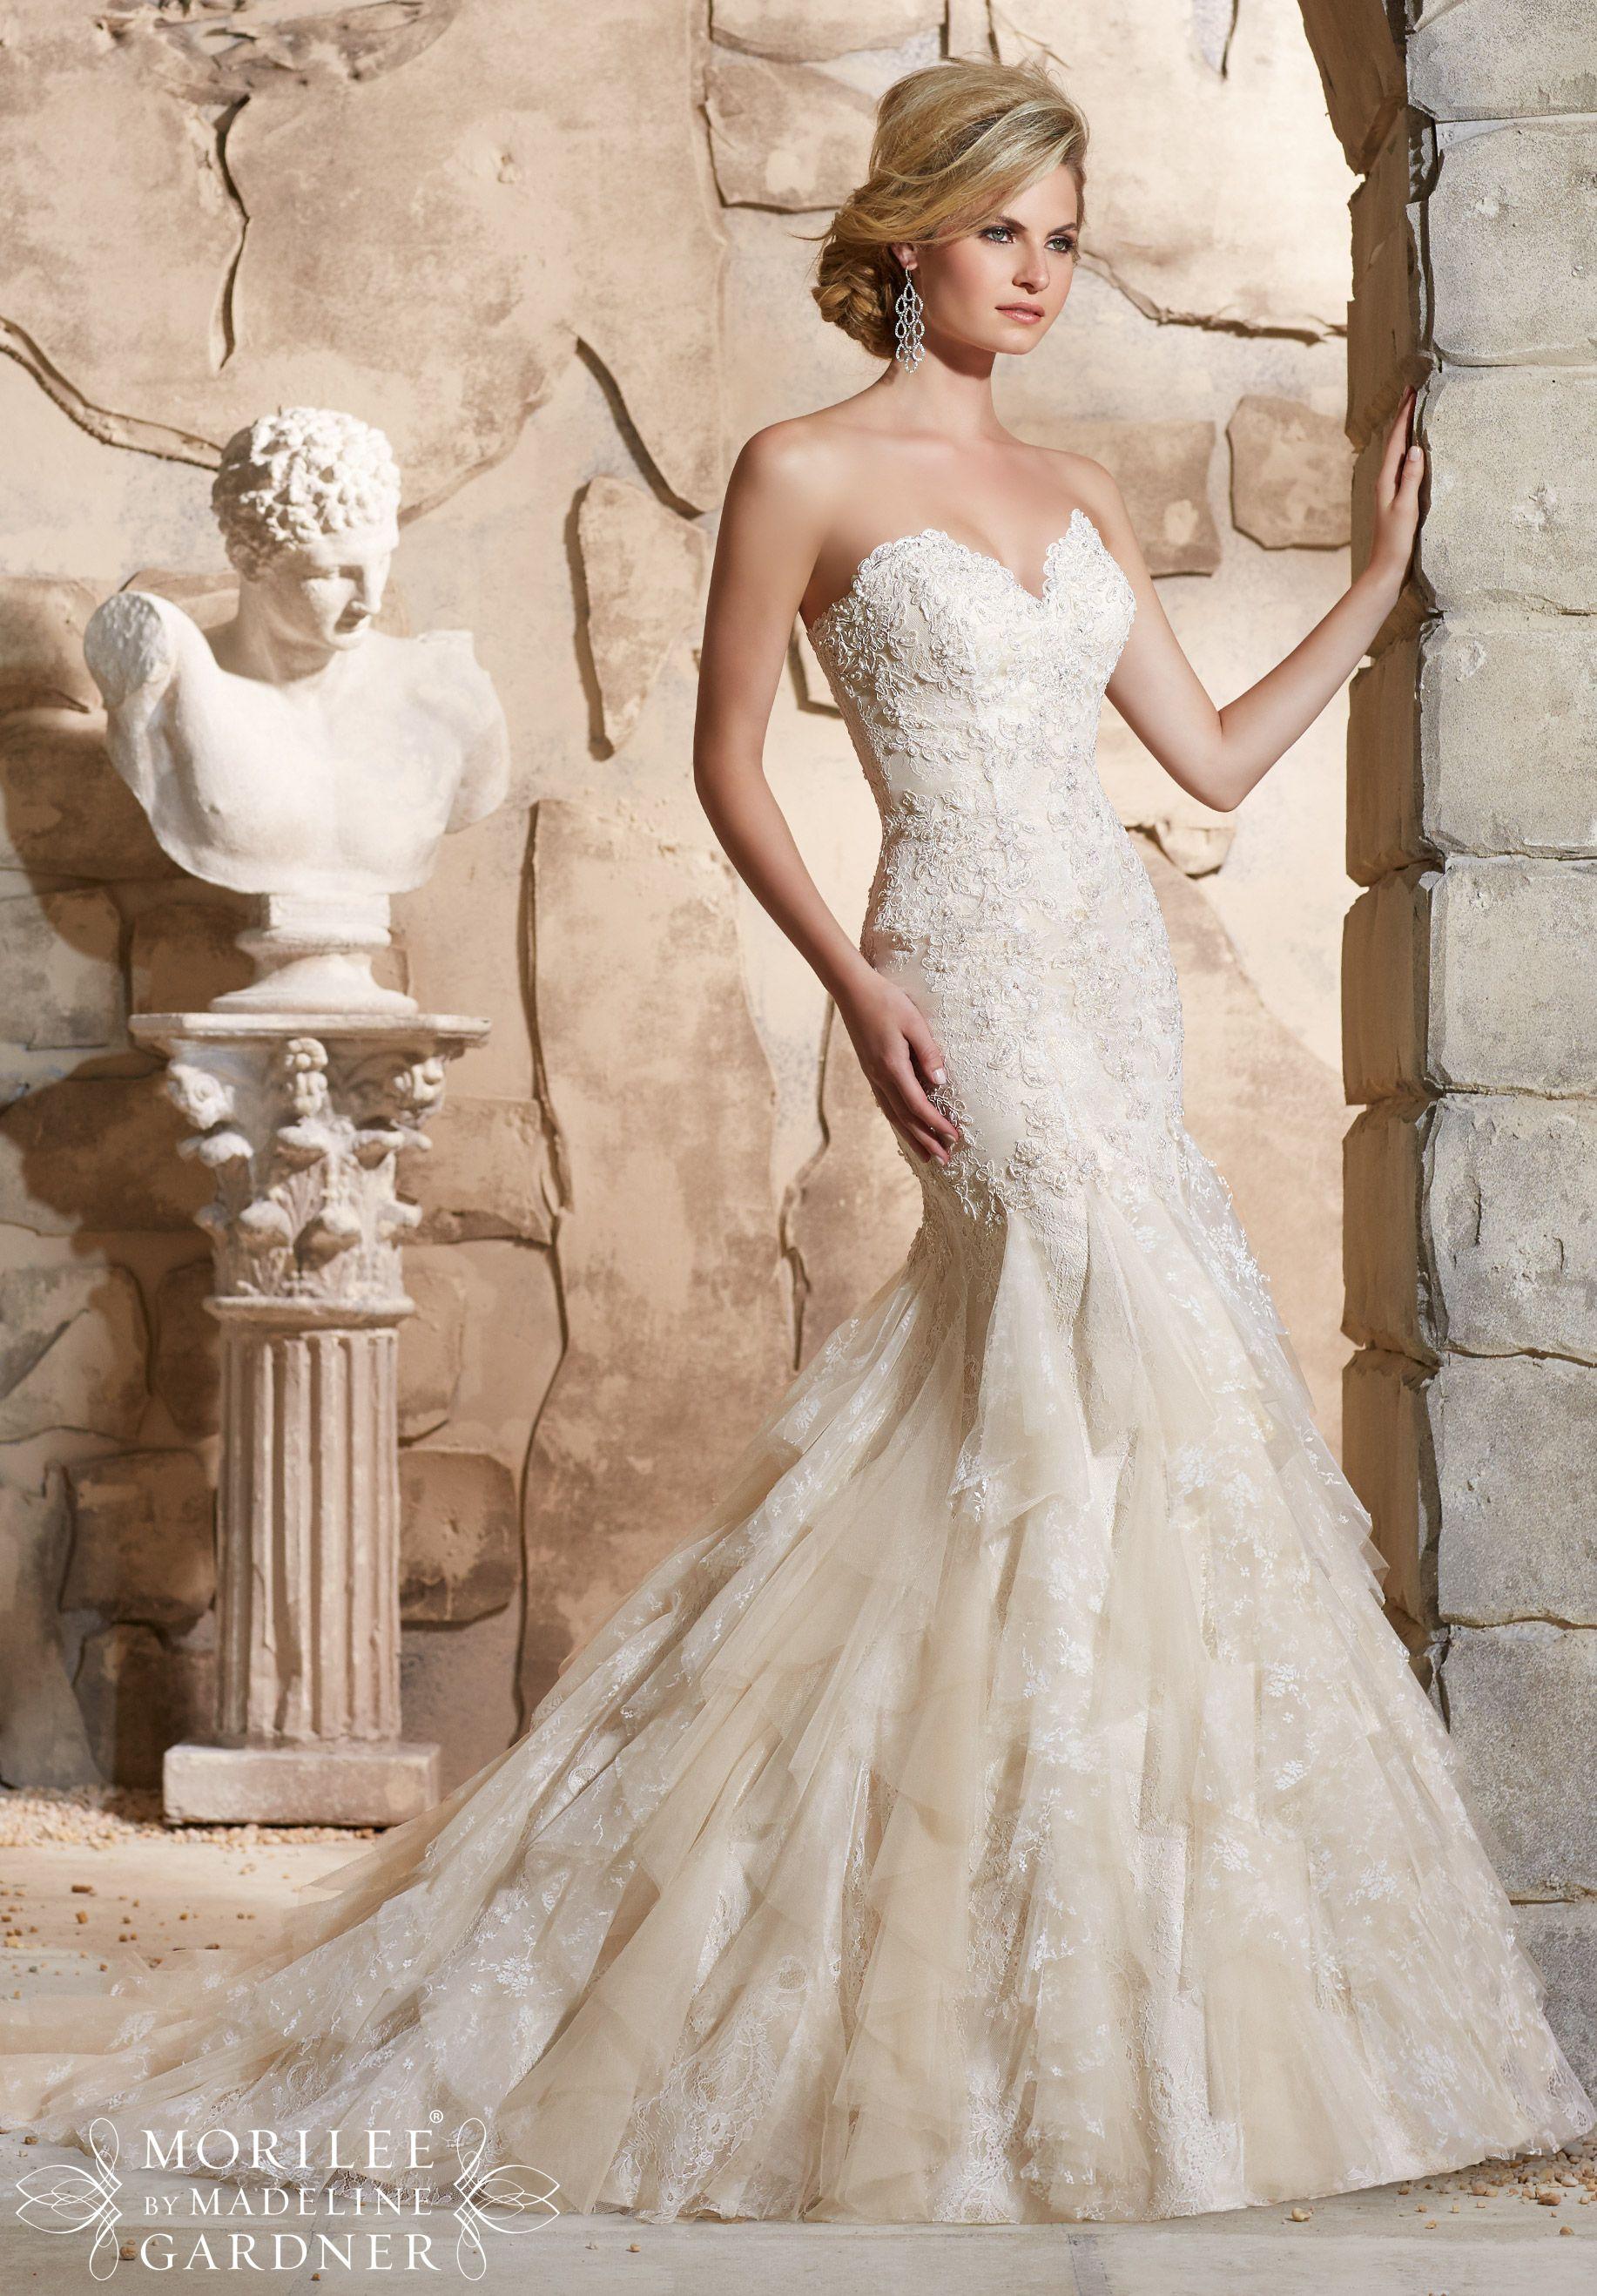 Chantilly lace wedding dress sydney